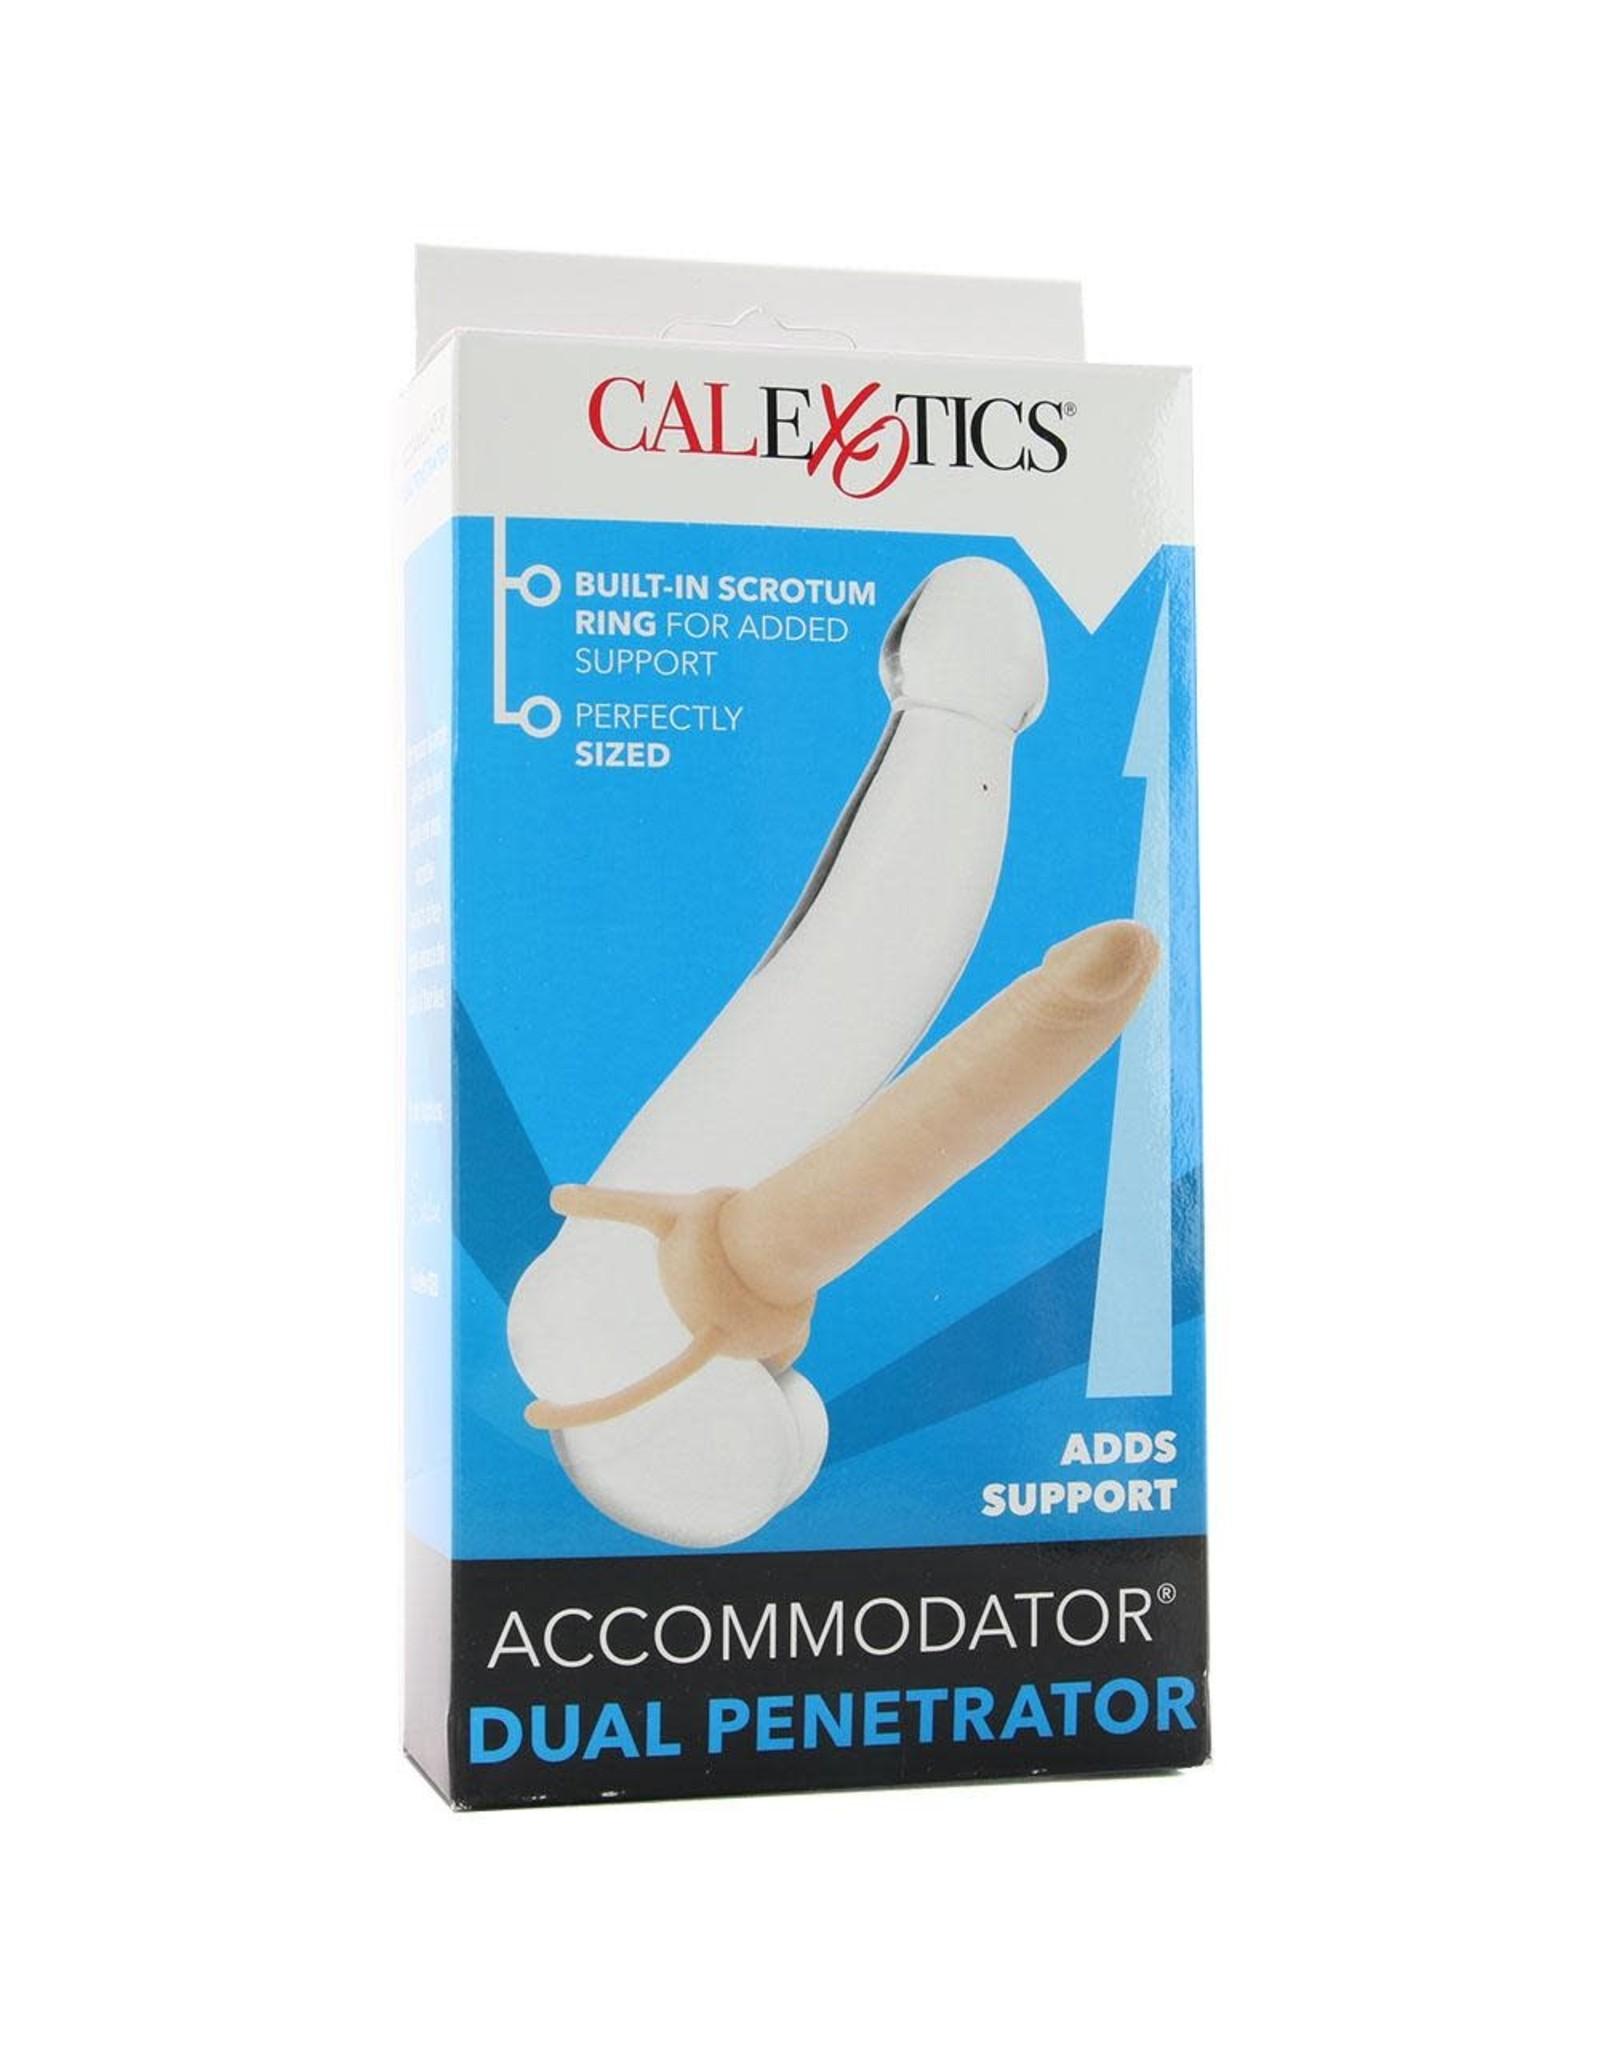 Calexotics Accommodator- Dual Penetrator in Ivory